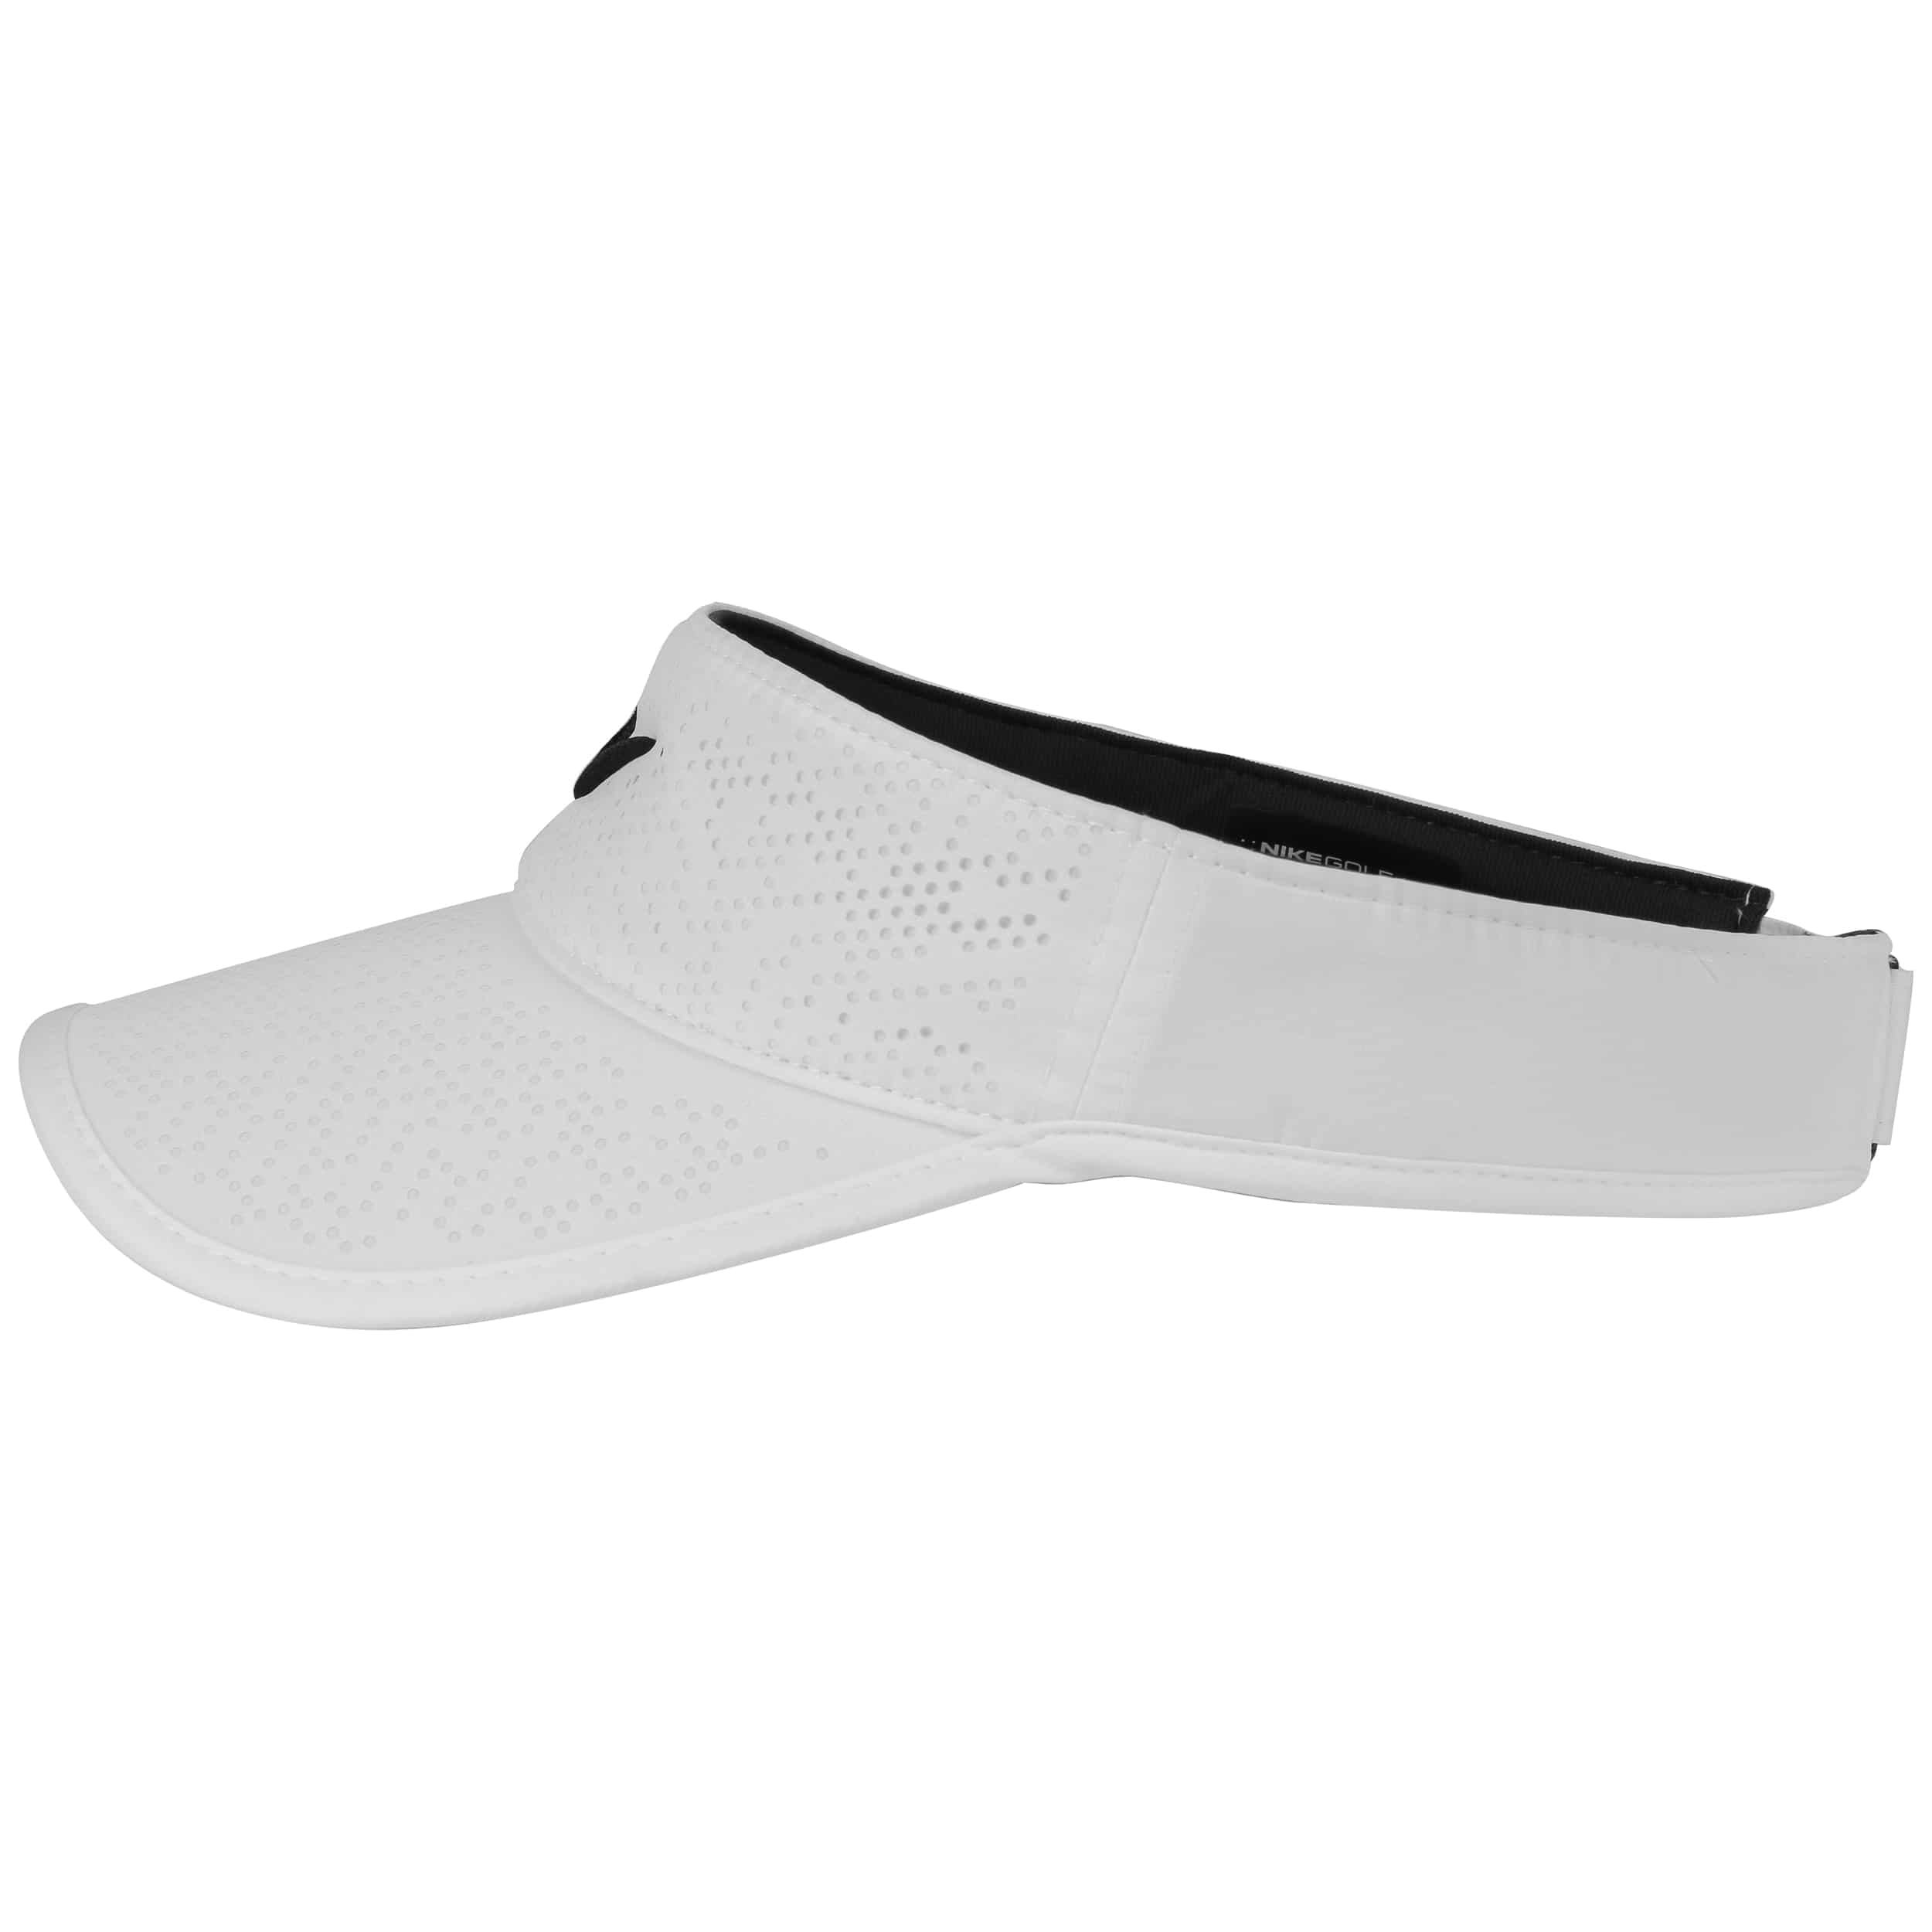 9c49a1371 Visera Tech Dri-FitVisor by Nike - Gorras - sombreroshop.es